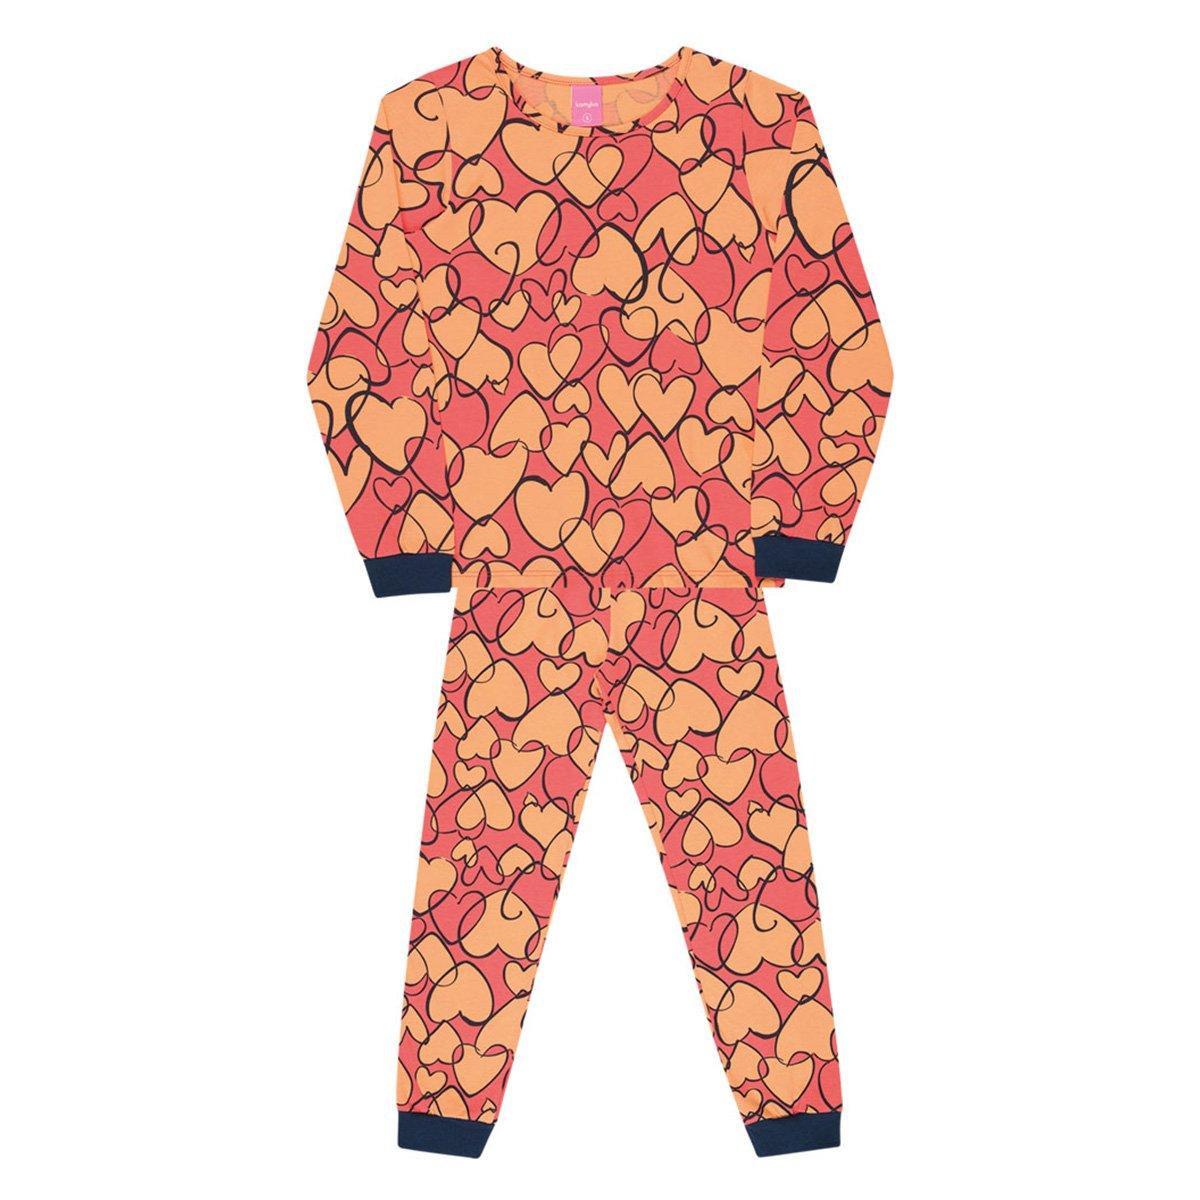 Pijama Infantil Kamylus Corações Meia Malha Longo